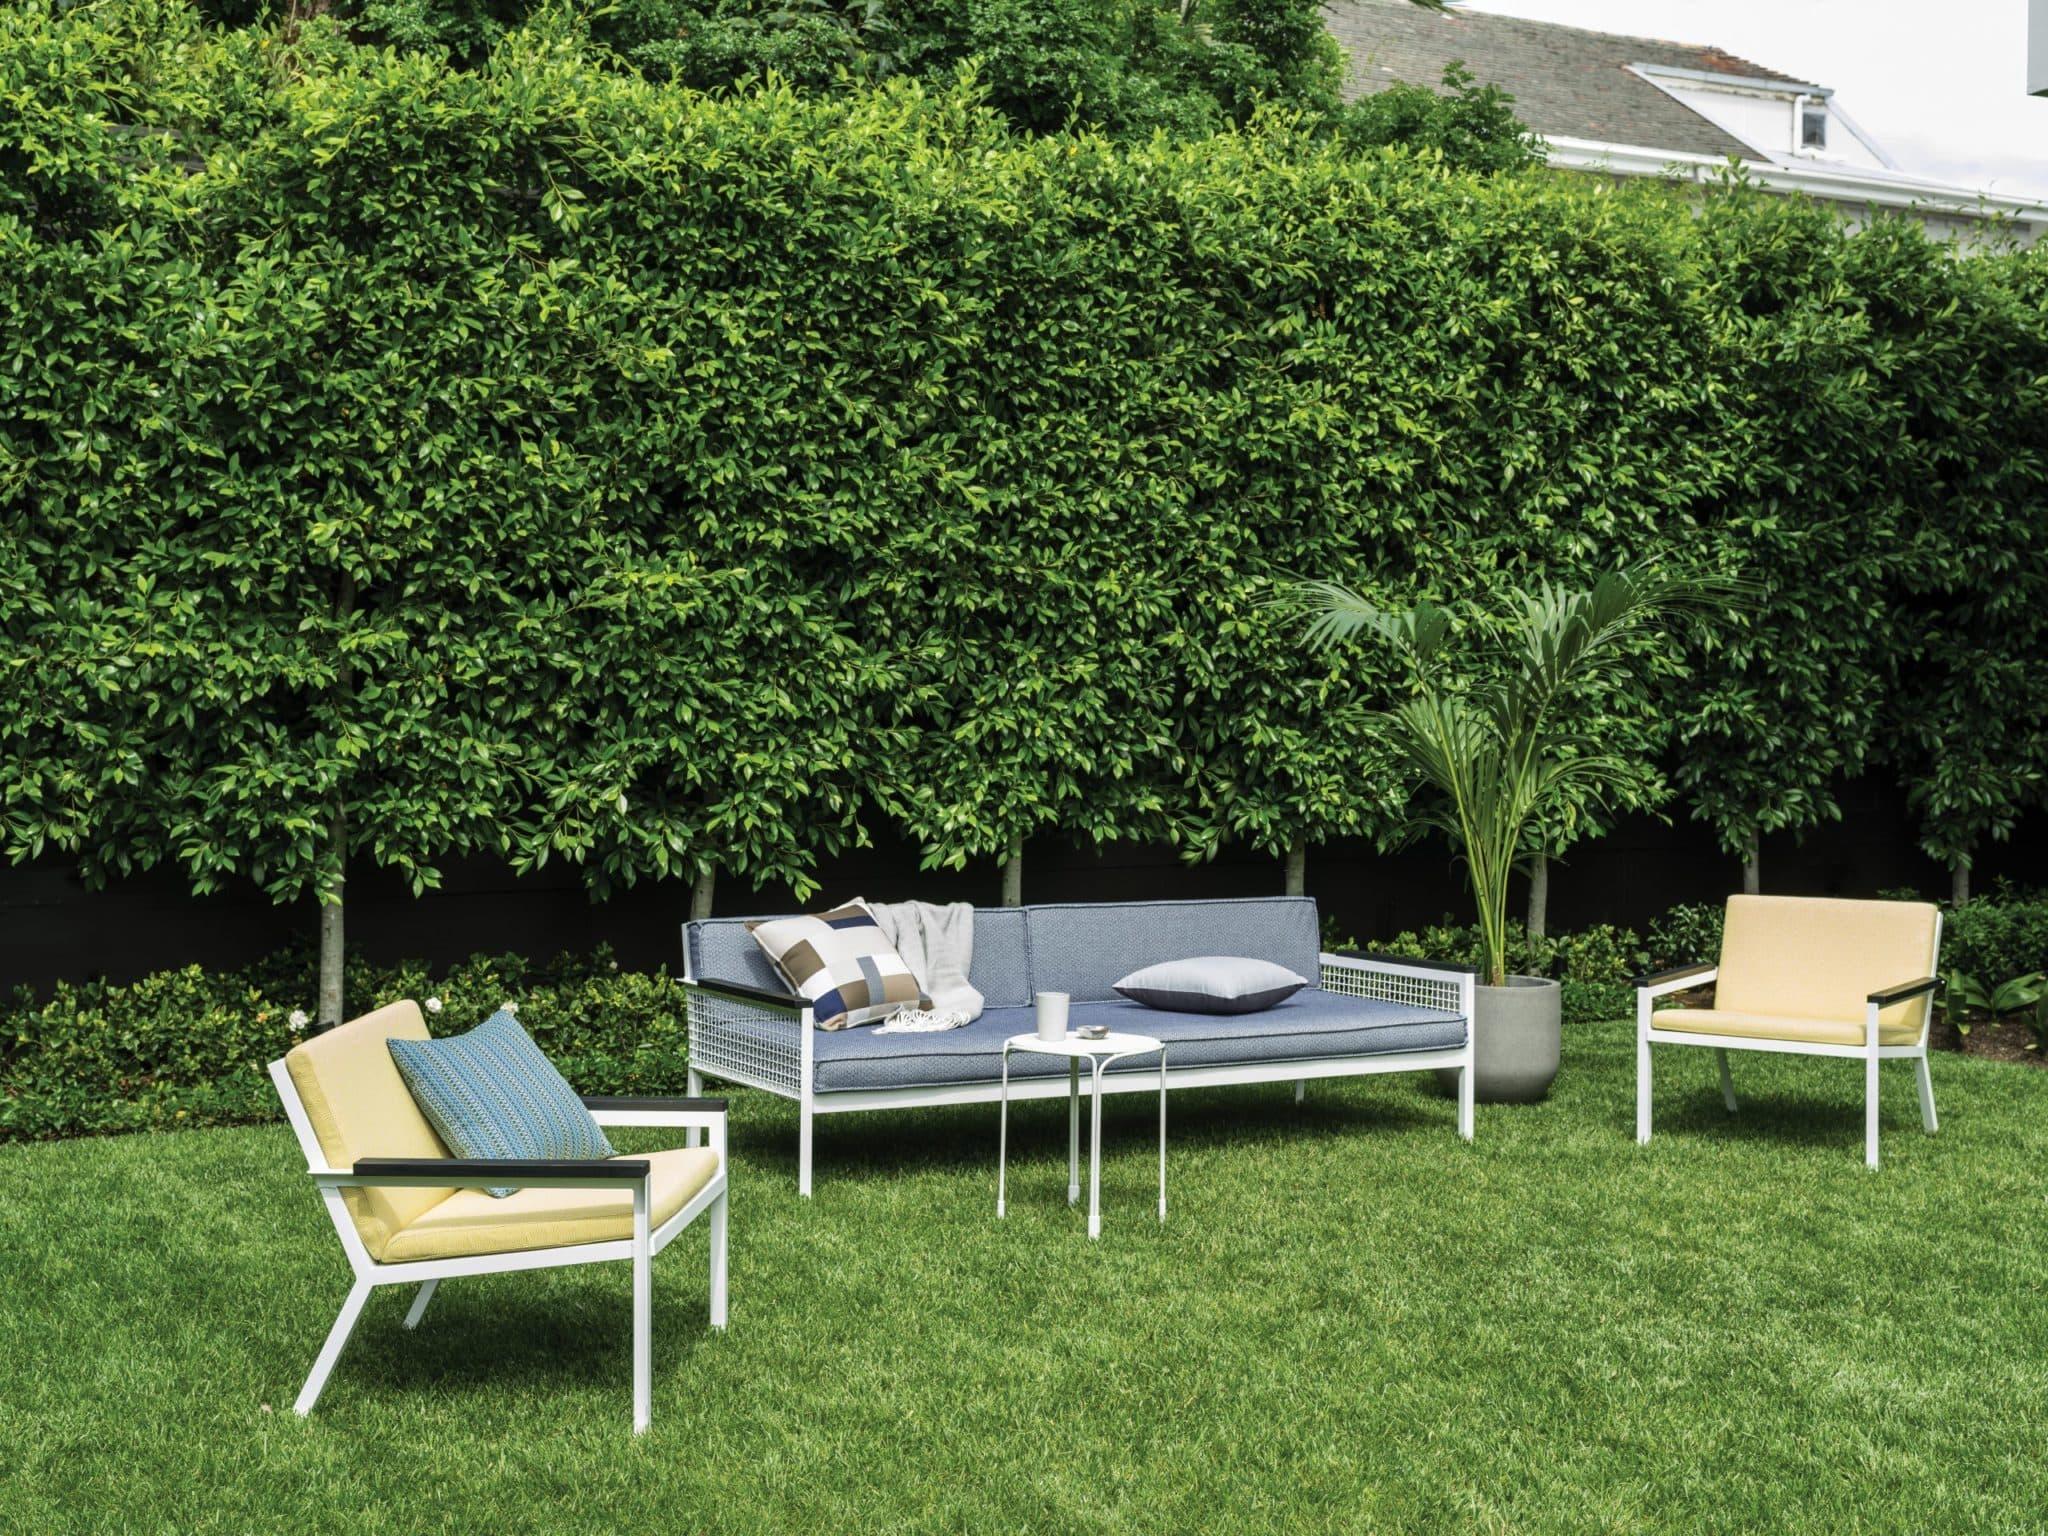 Premium Outdoor Lounge Chair